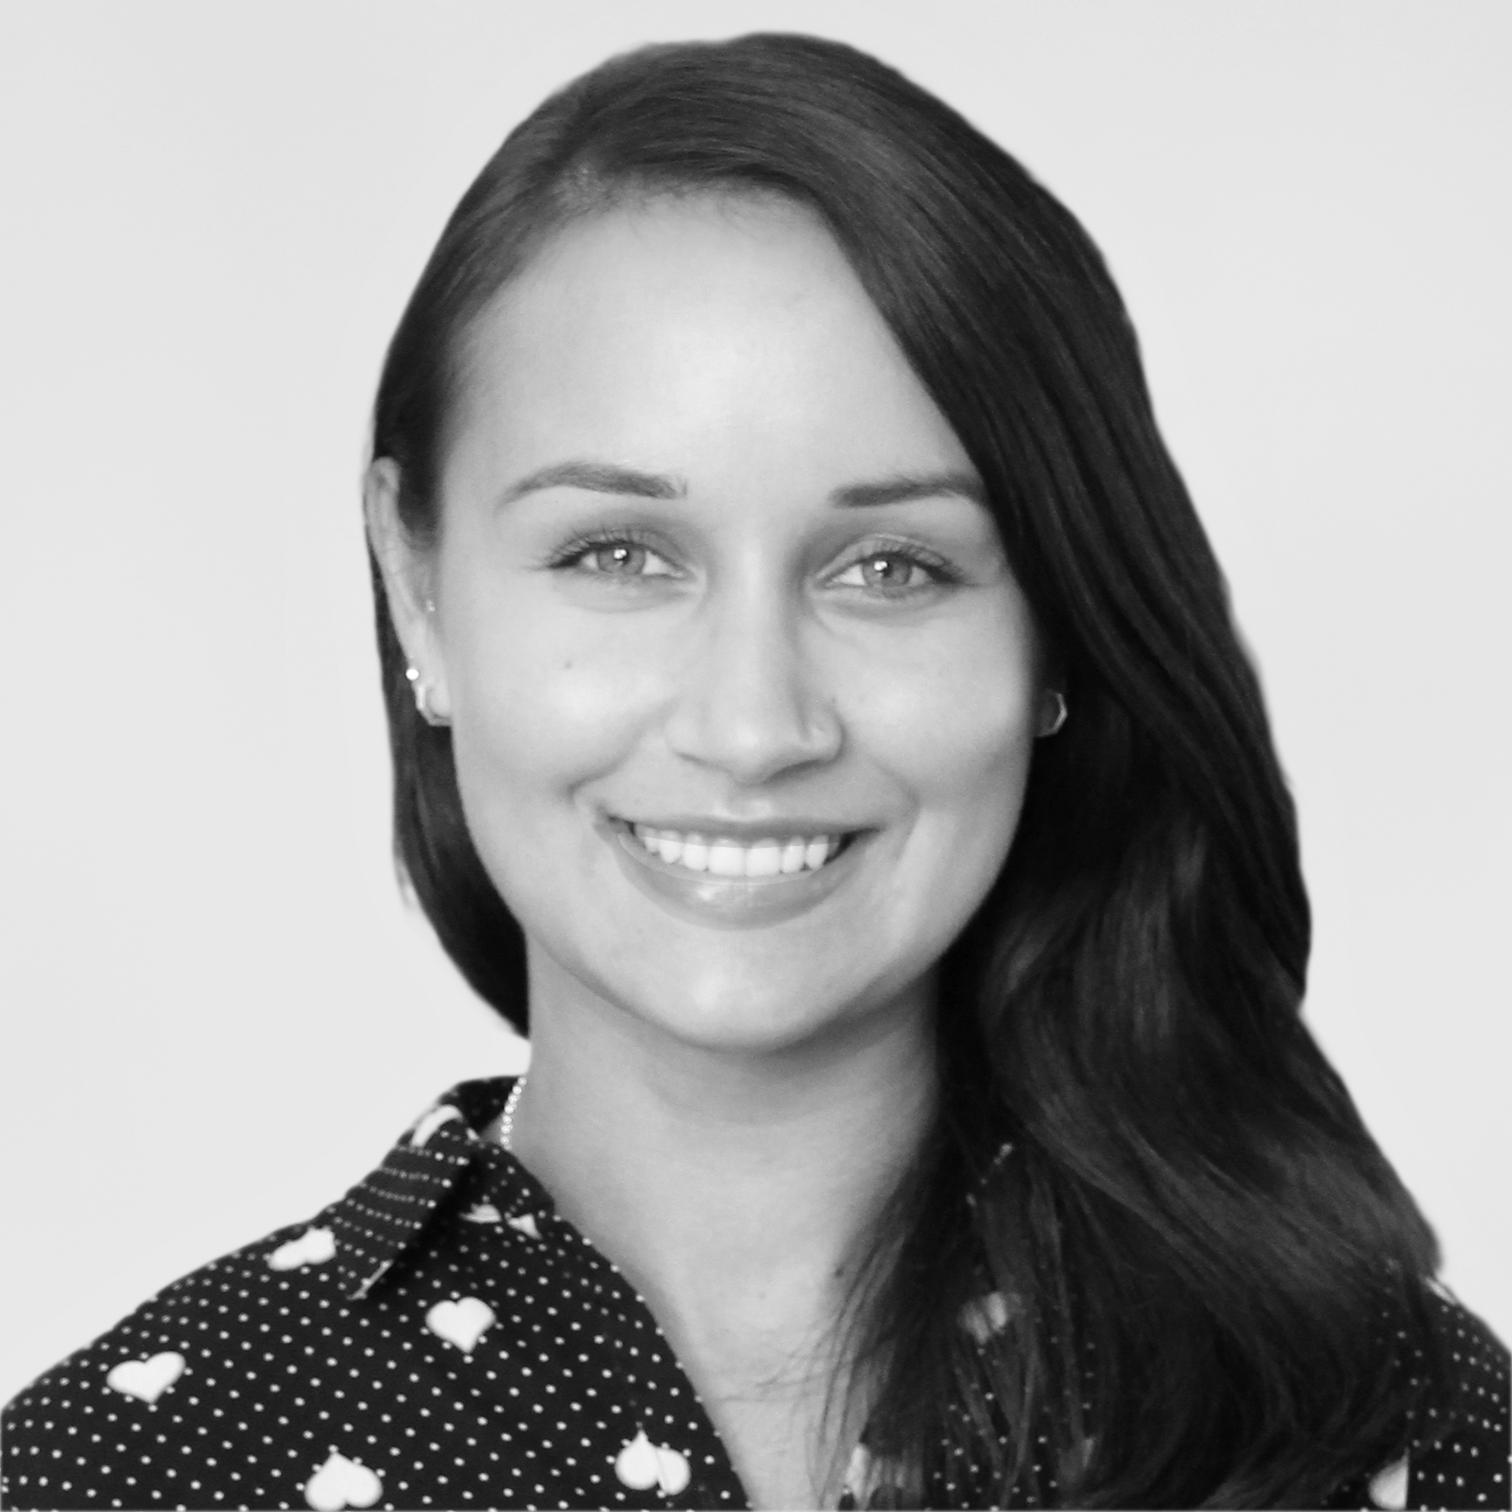 https://ksrarchitects.com/wp-content/uploads/2020/12/Paige-Arnold.jpg